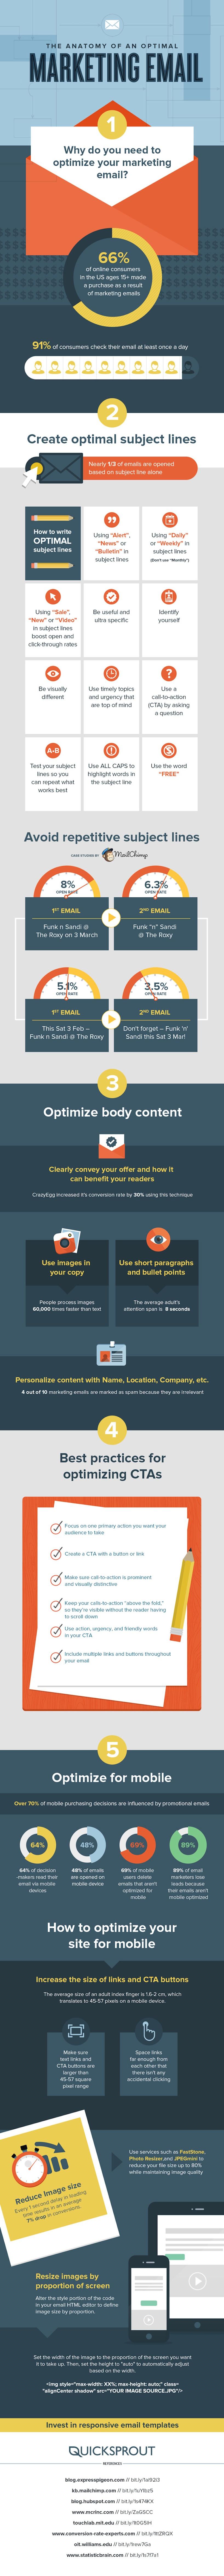 optimal-marketing-email-infographic.jpg